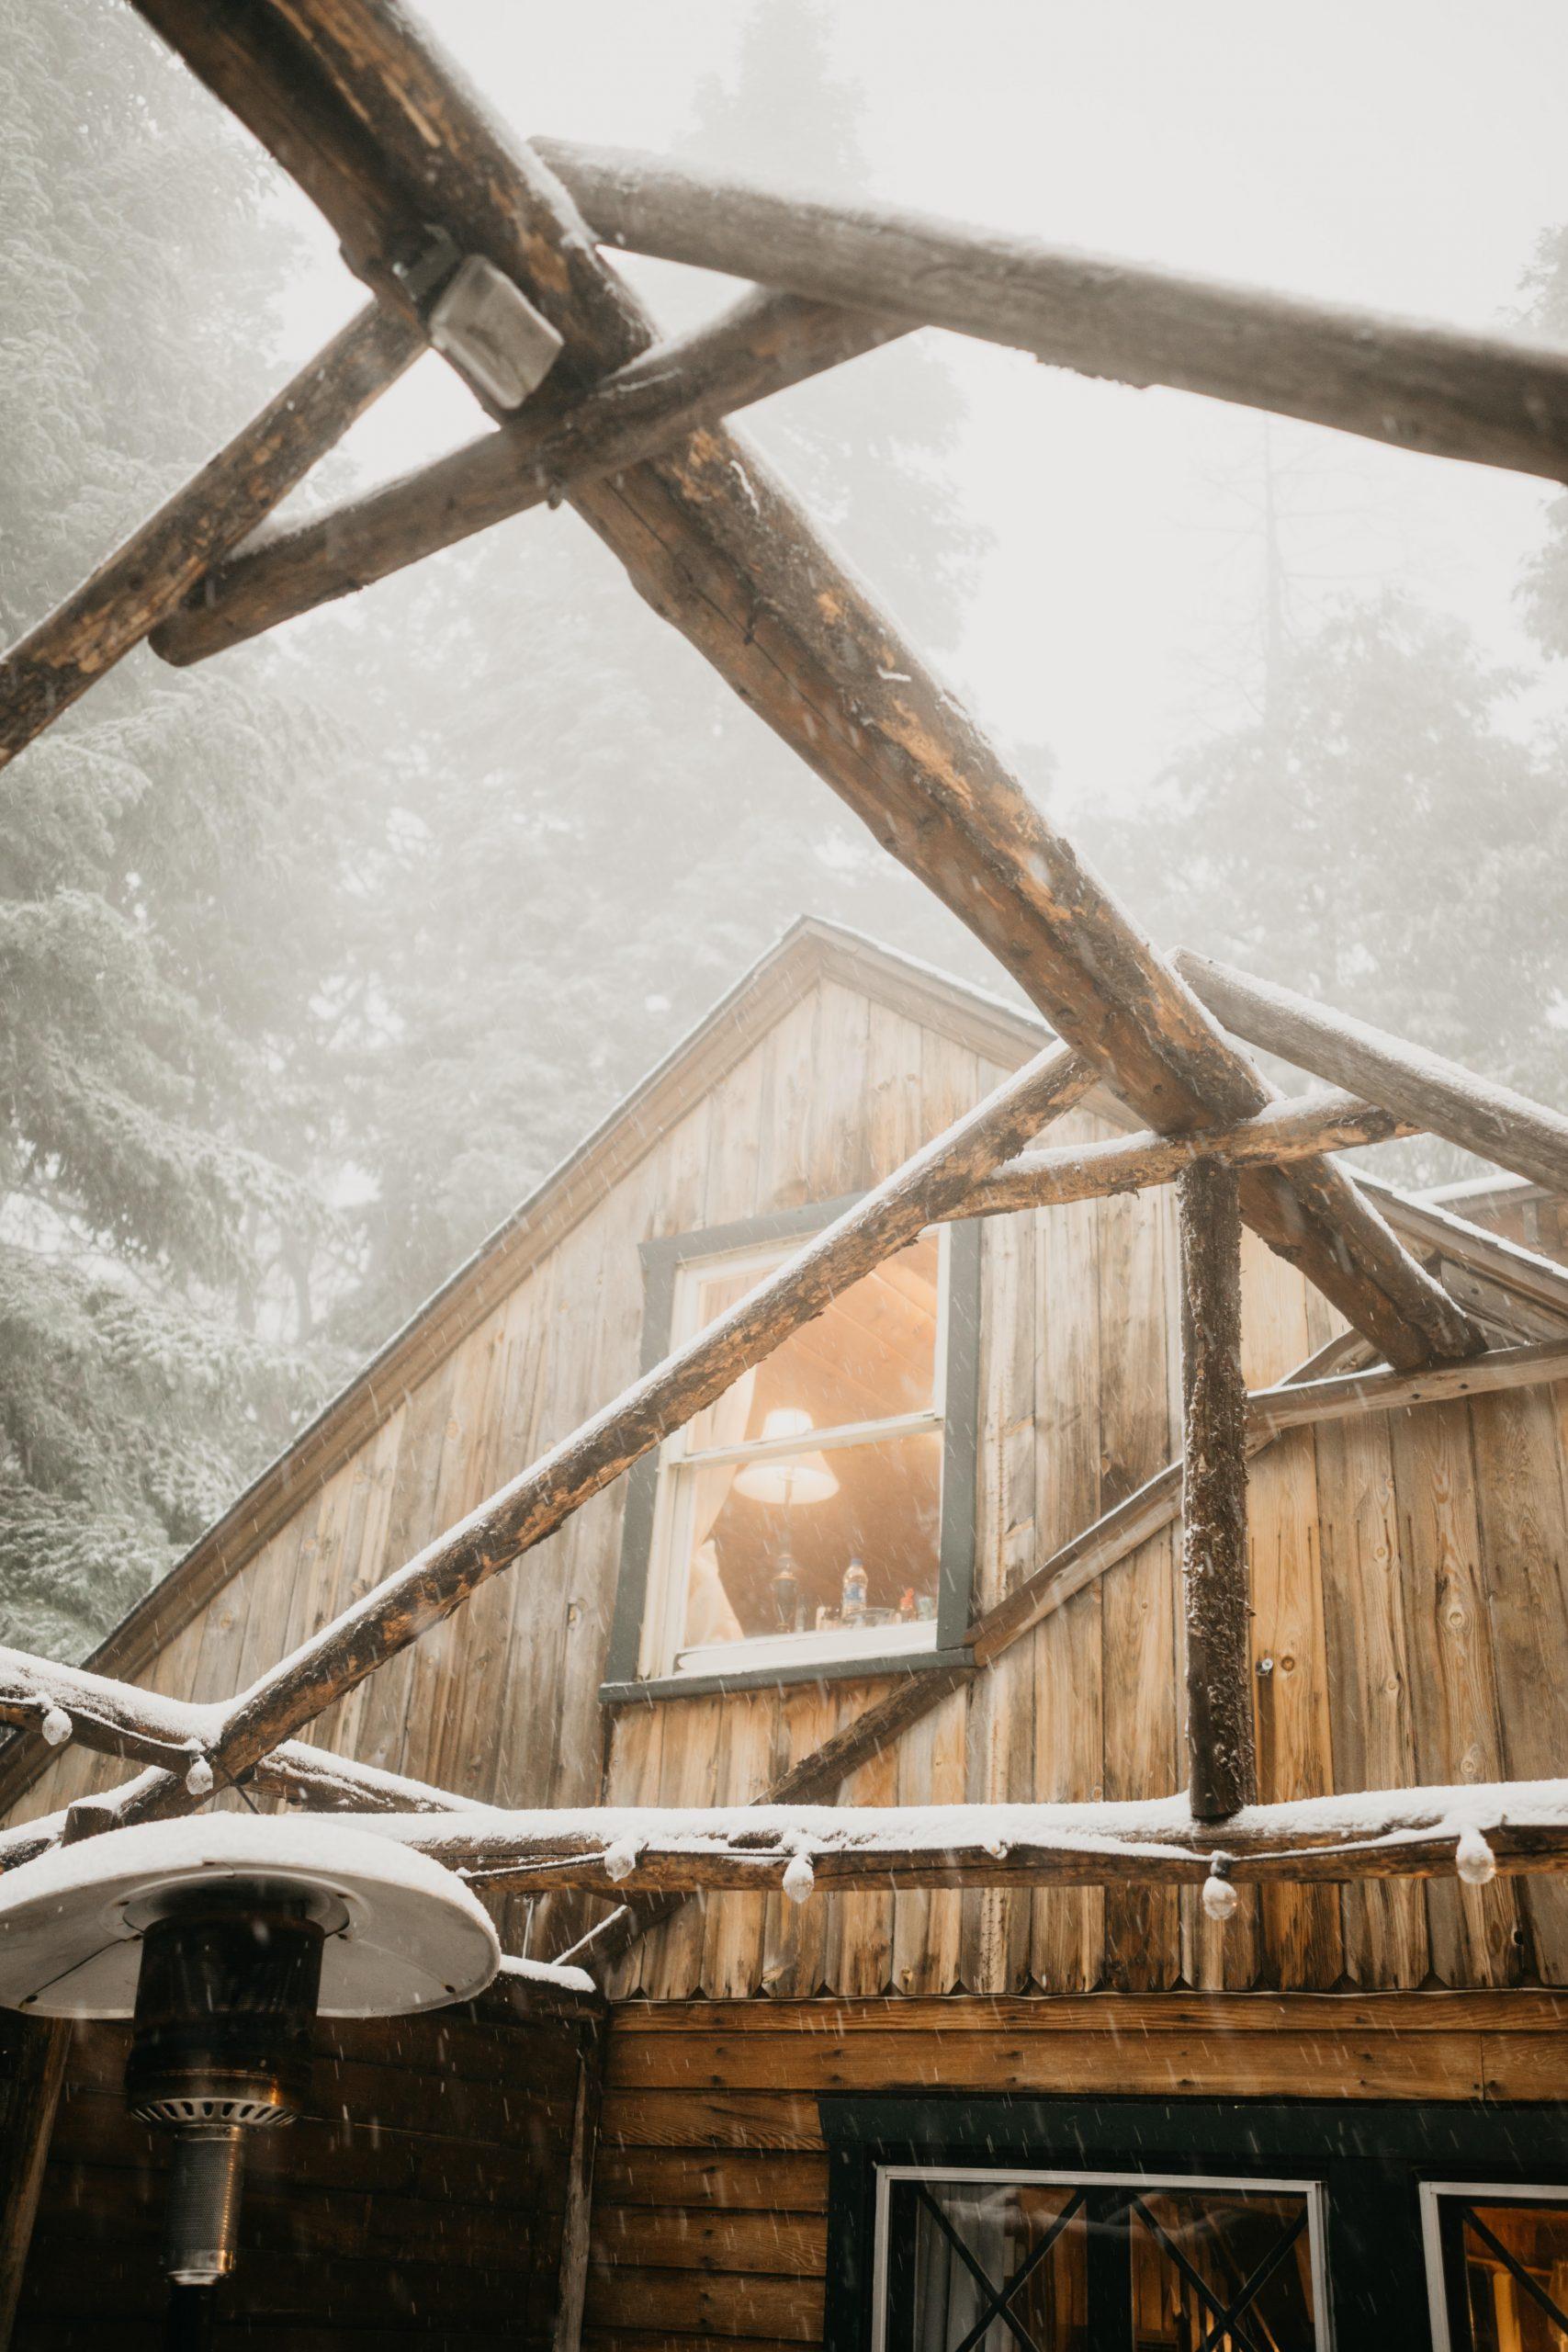 Arrowhead Pine Rose Cabin, image by Fatima Elreda Photo